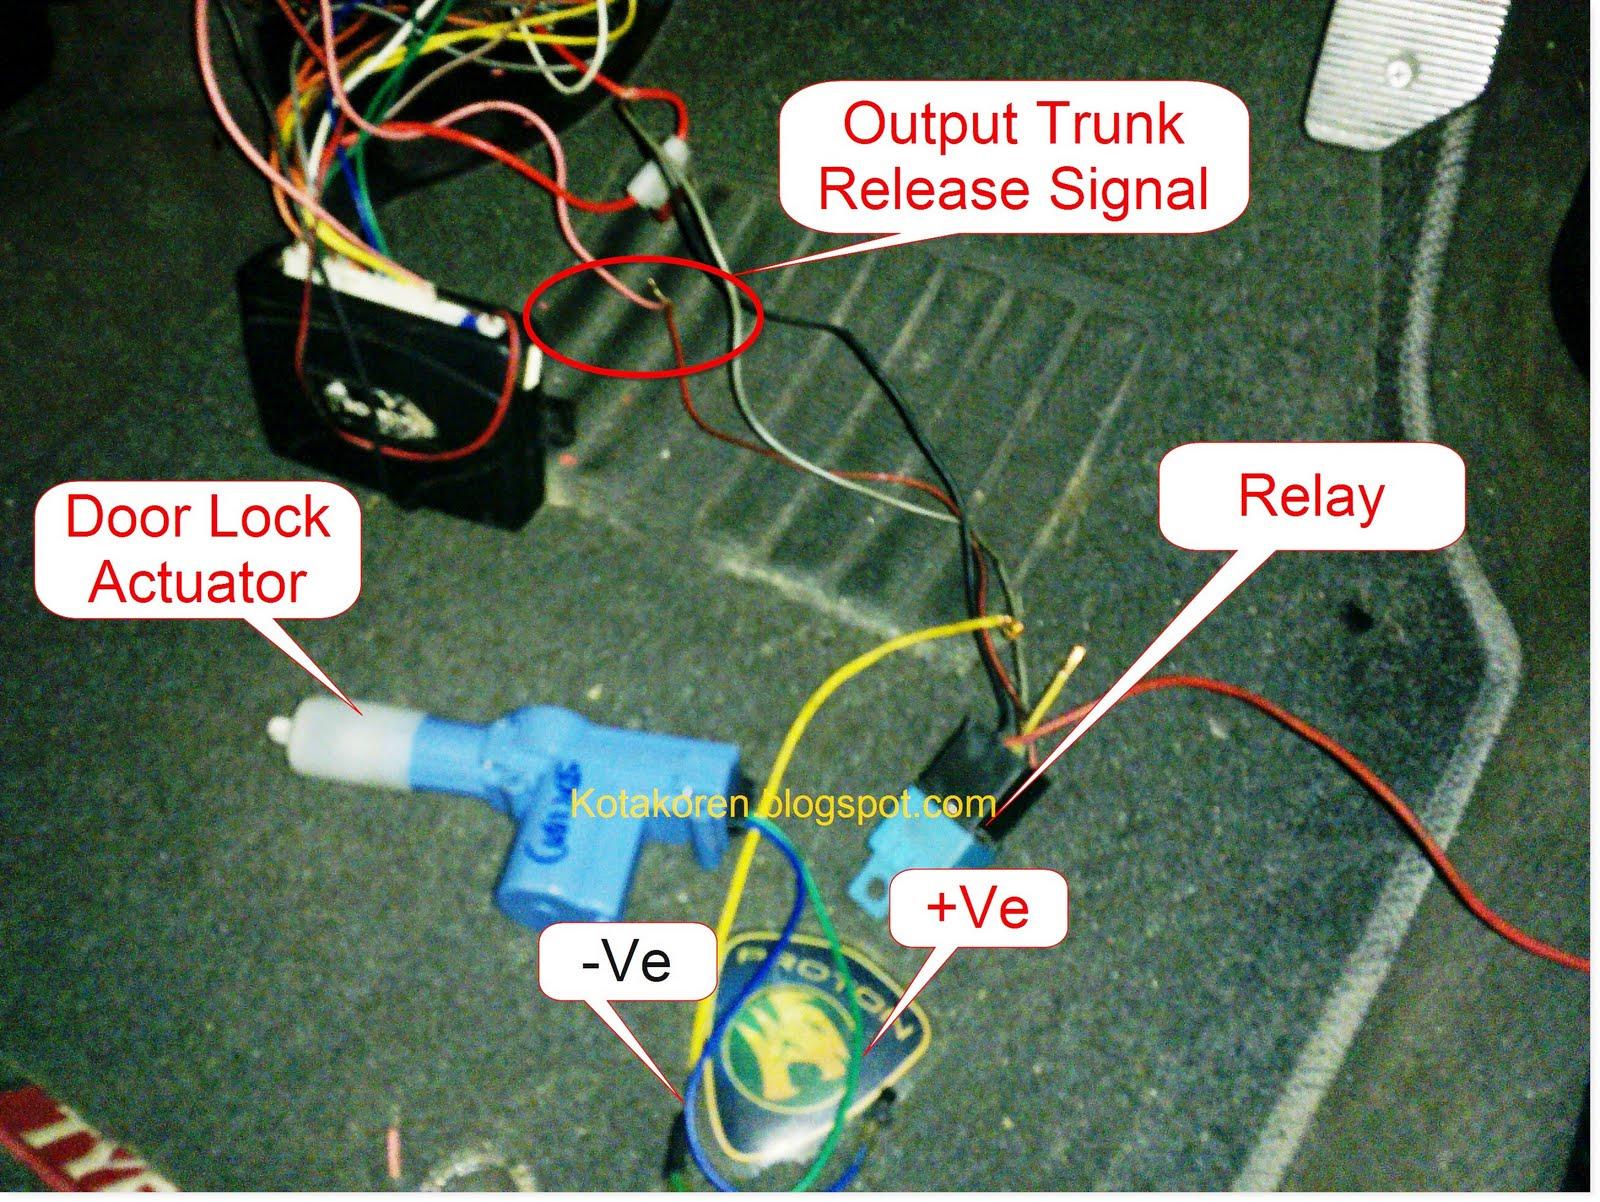 trunk release ranchangan diy kembali kotak oren rh kotakoren blogspot com 5 Pin Relay Wiring Diagram Arduino Relay Wiring